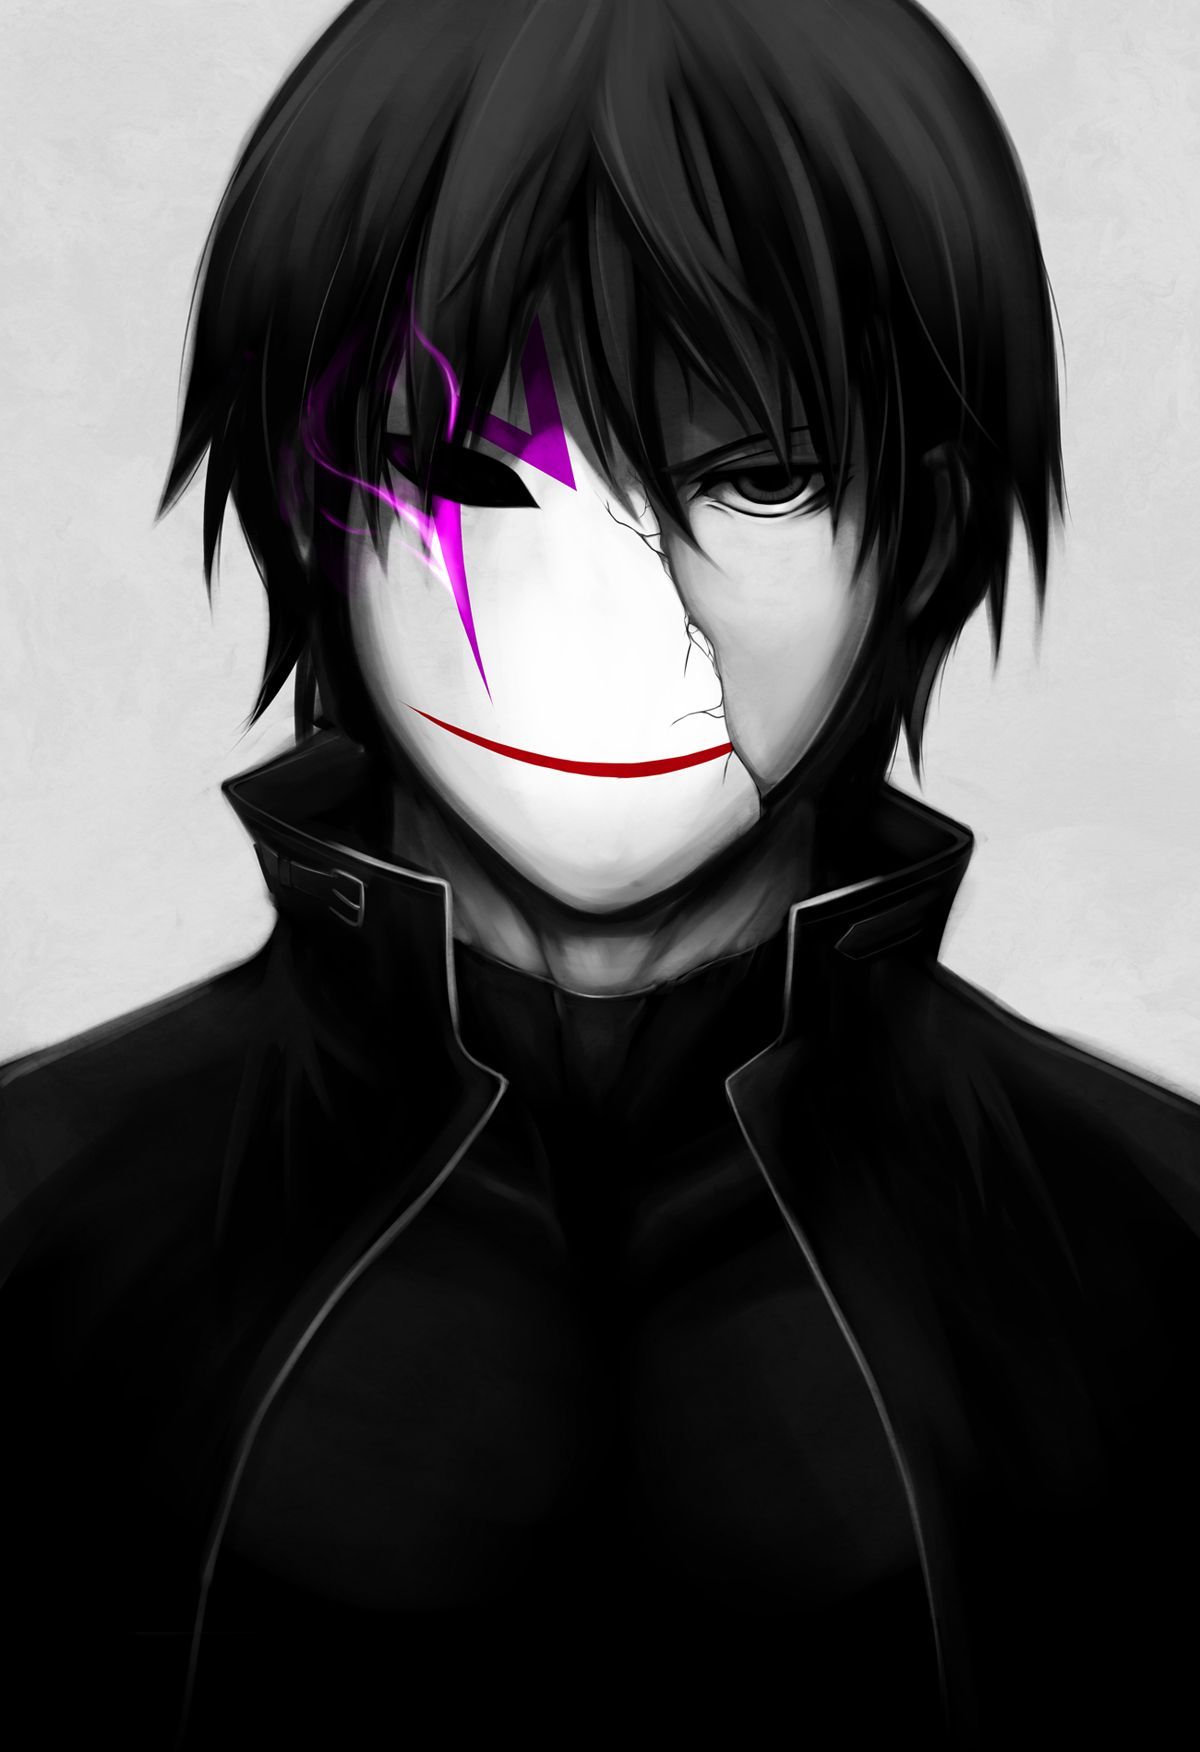 Hei from Darker than Black anime manga...... I'm just